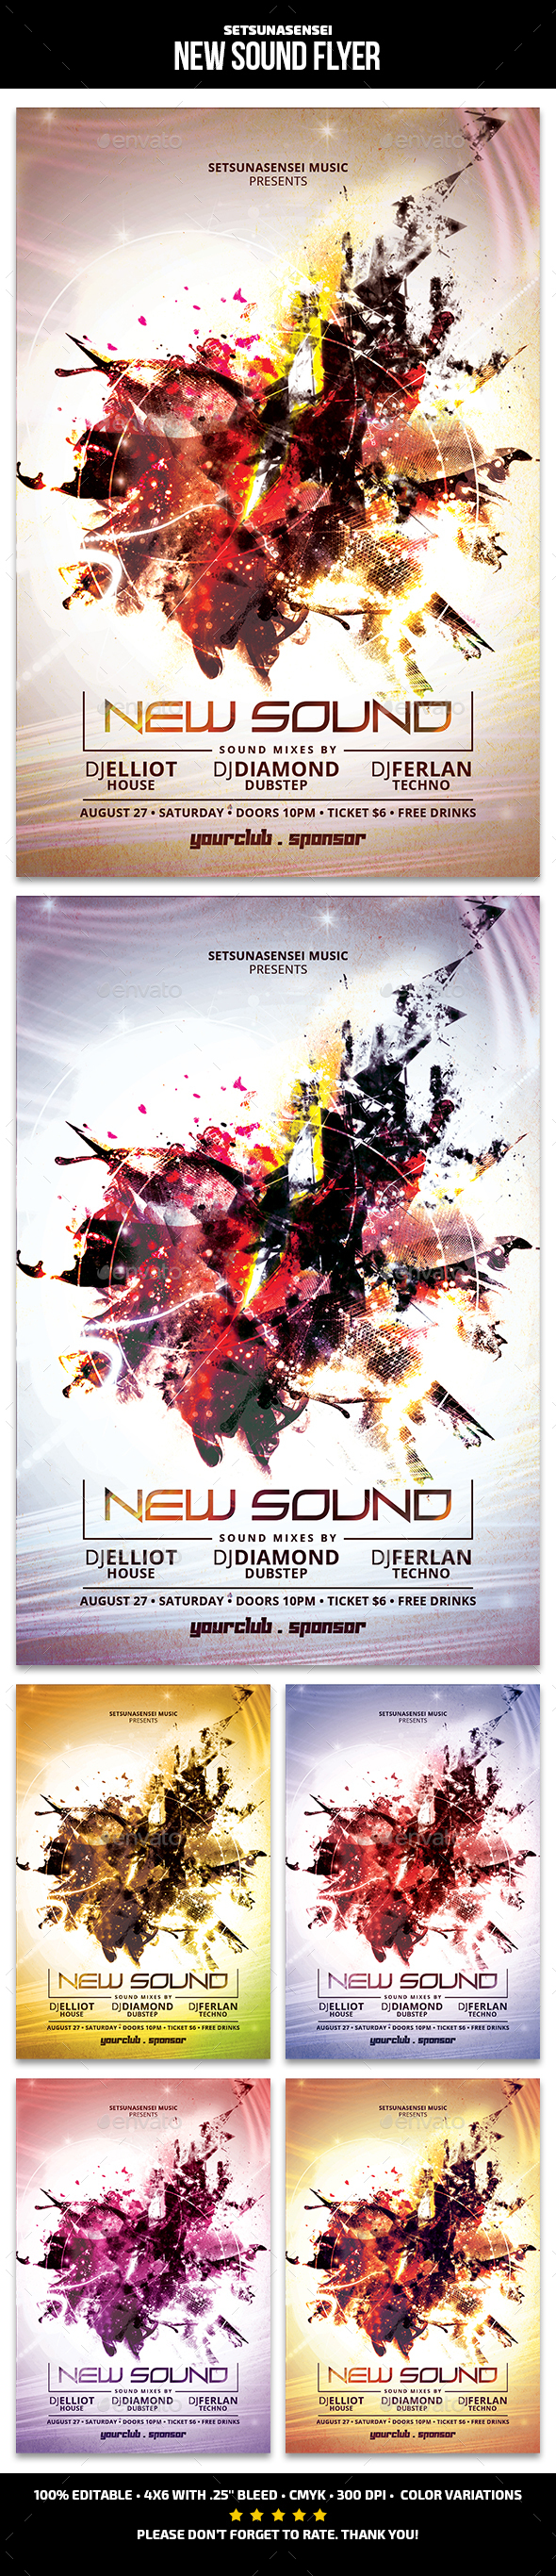 New Sound Flyer